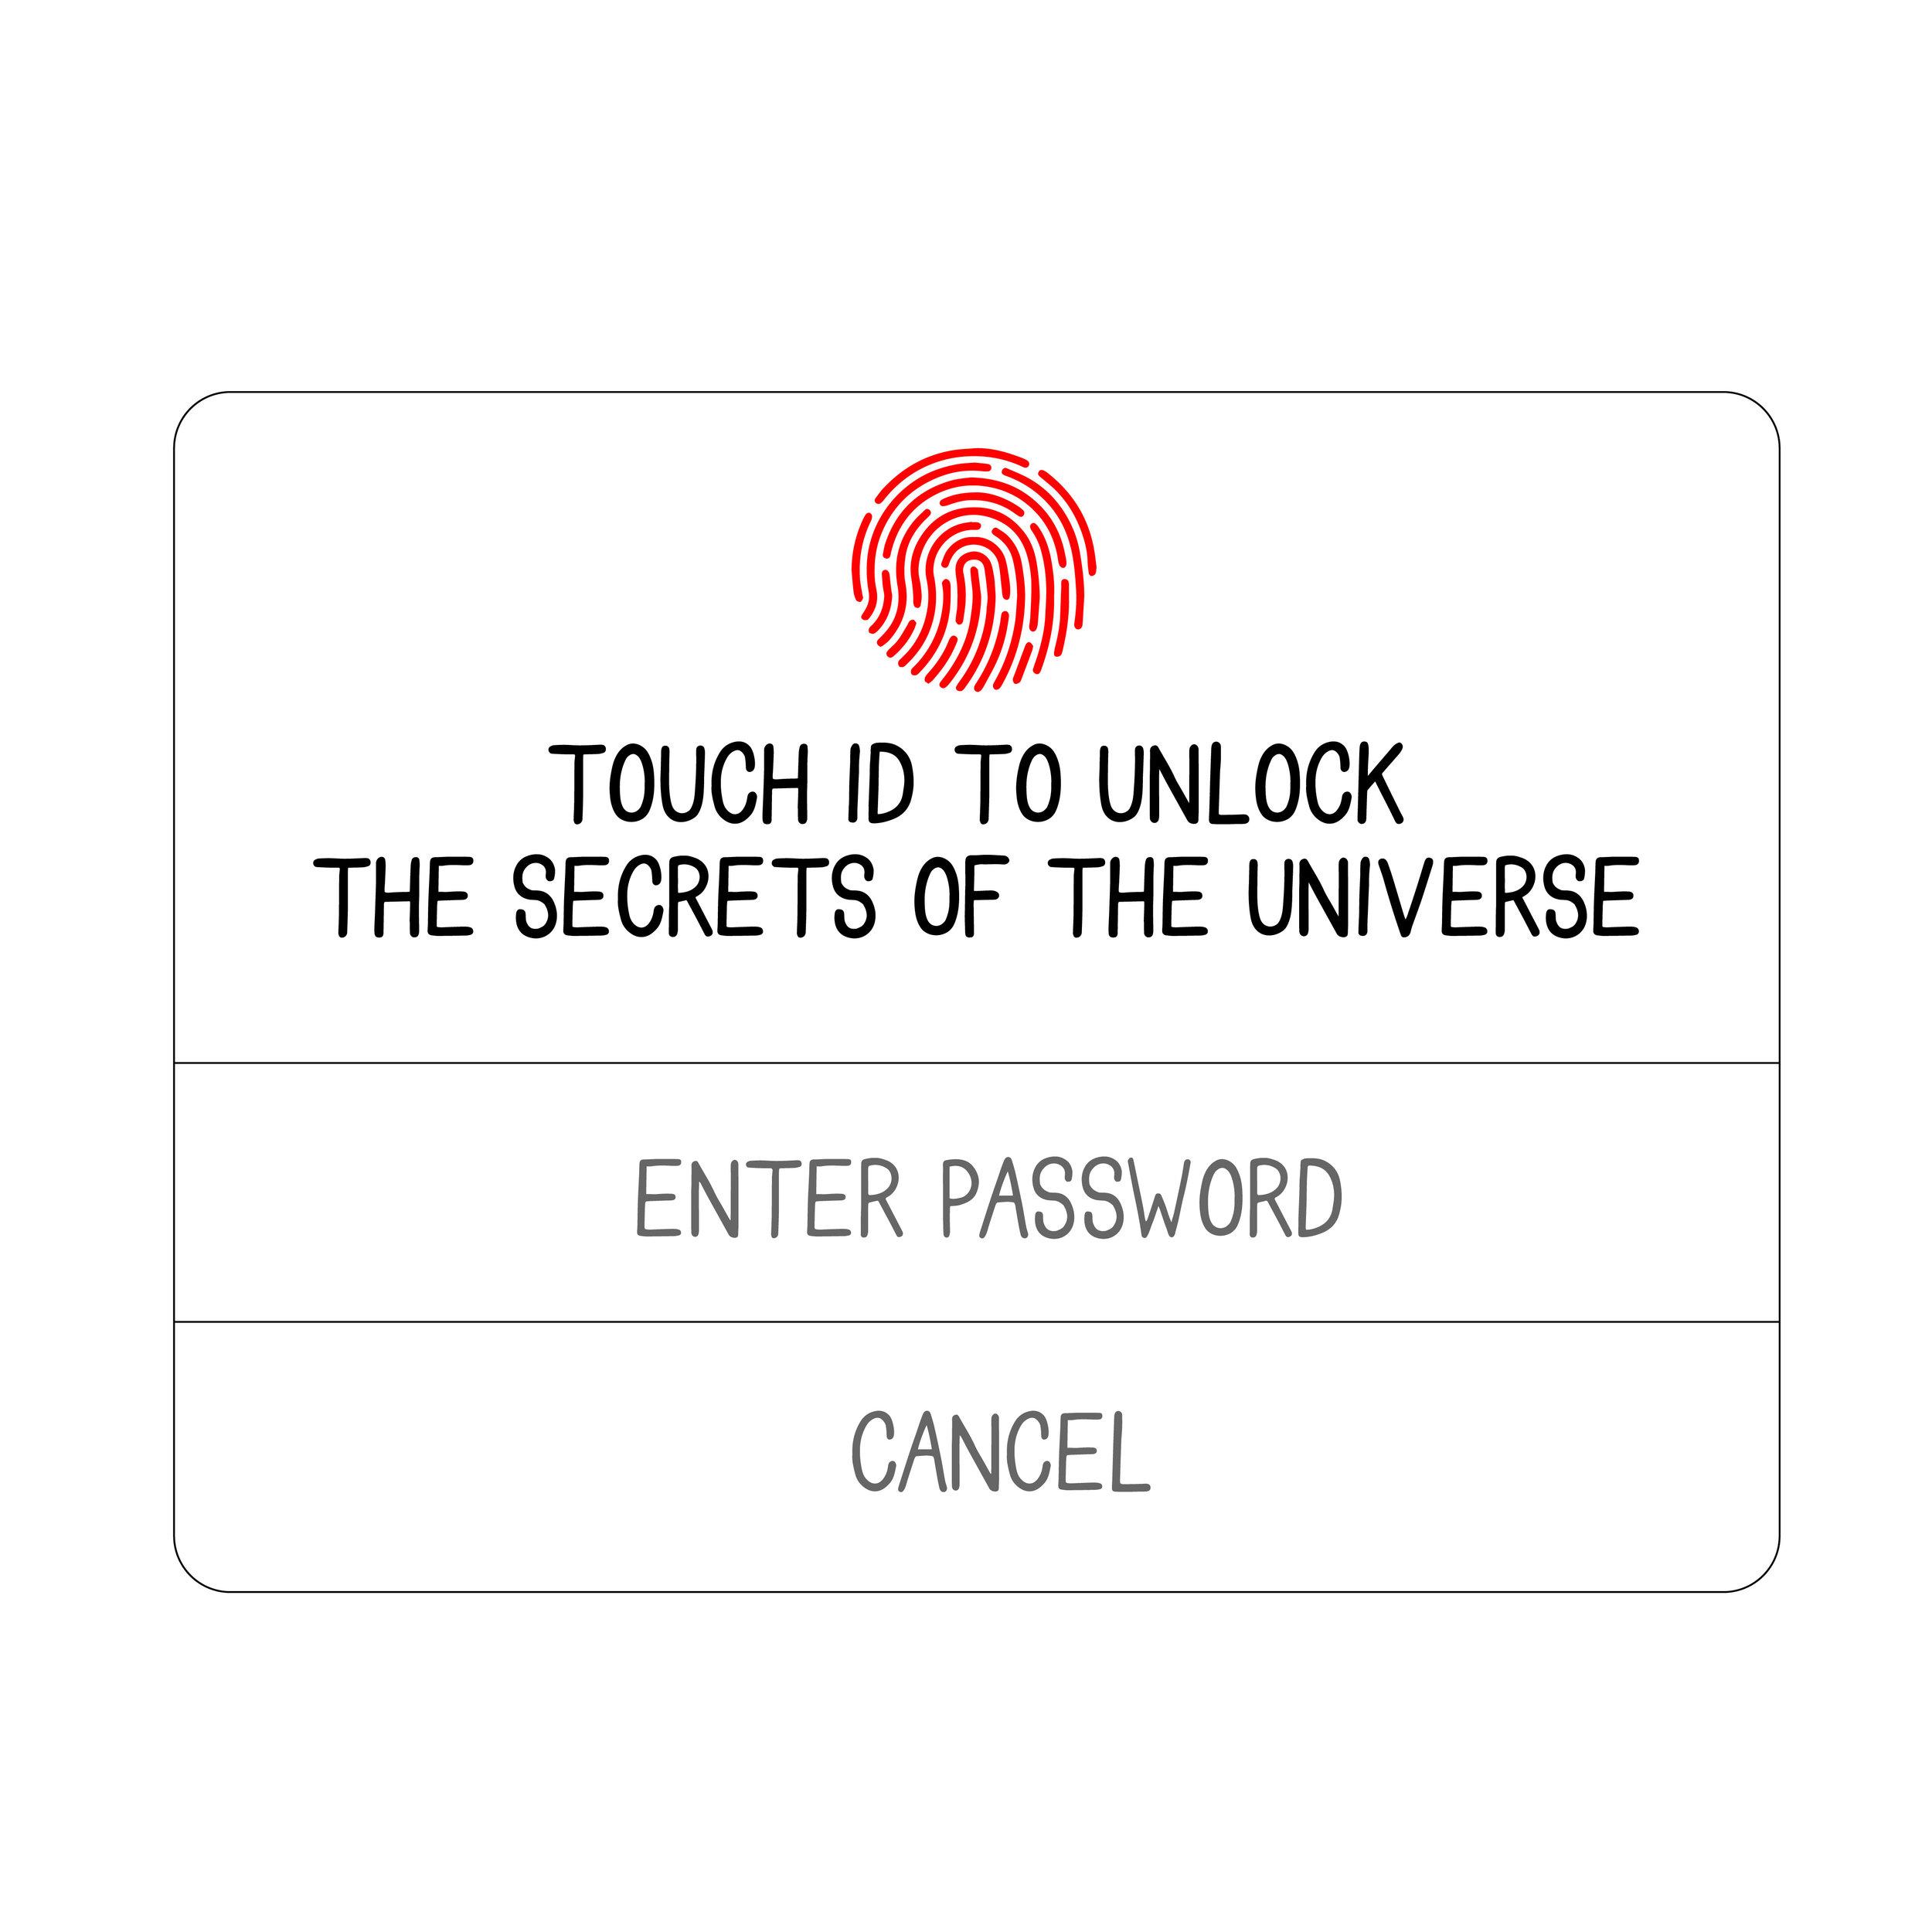 touchid-01.jpg